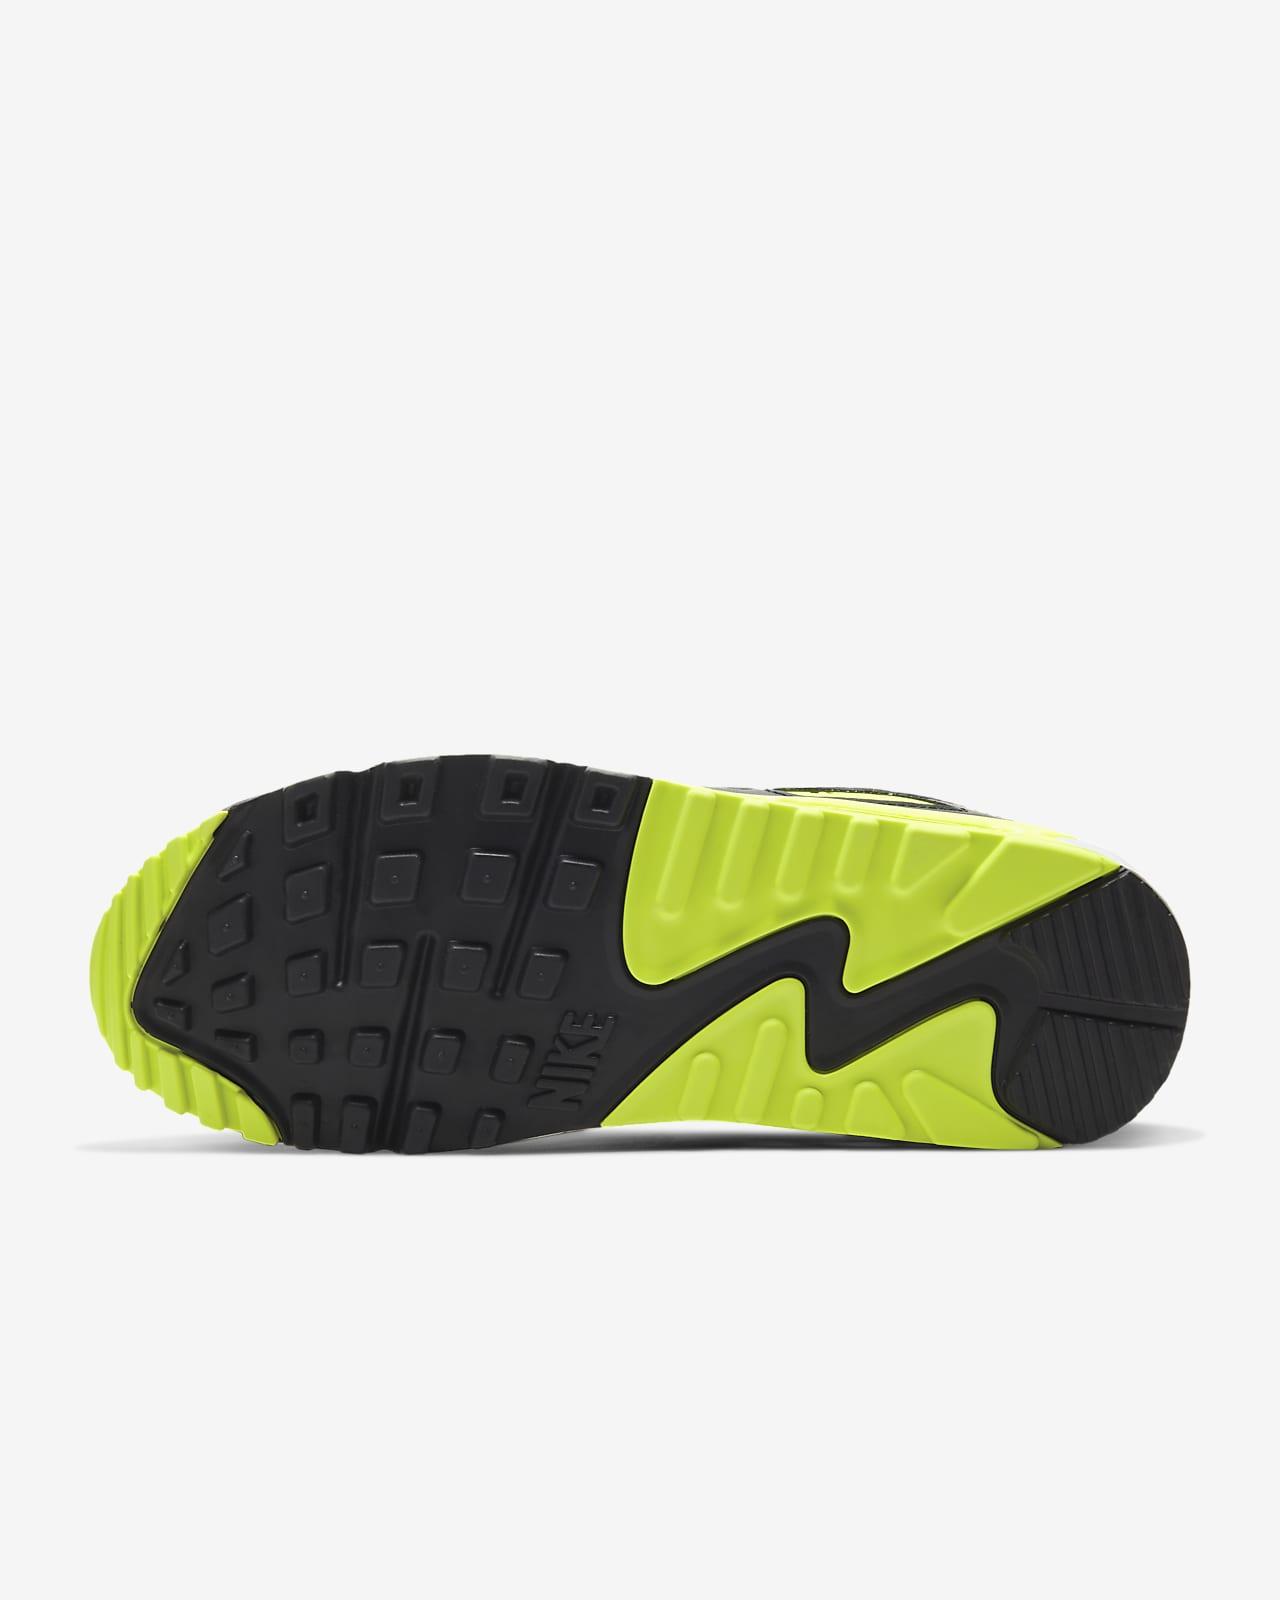 nike air max 90 87 womens shoes green white new